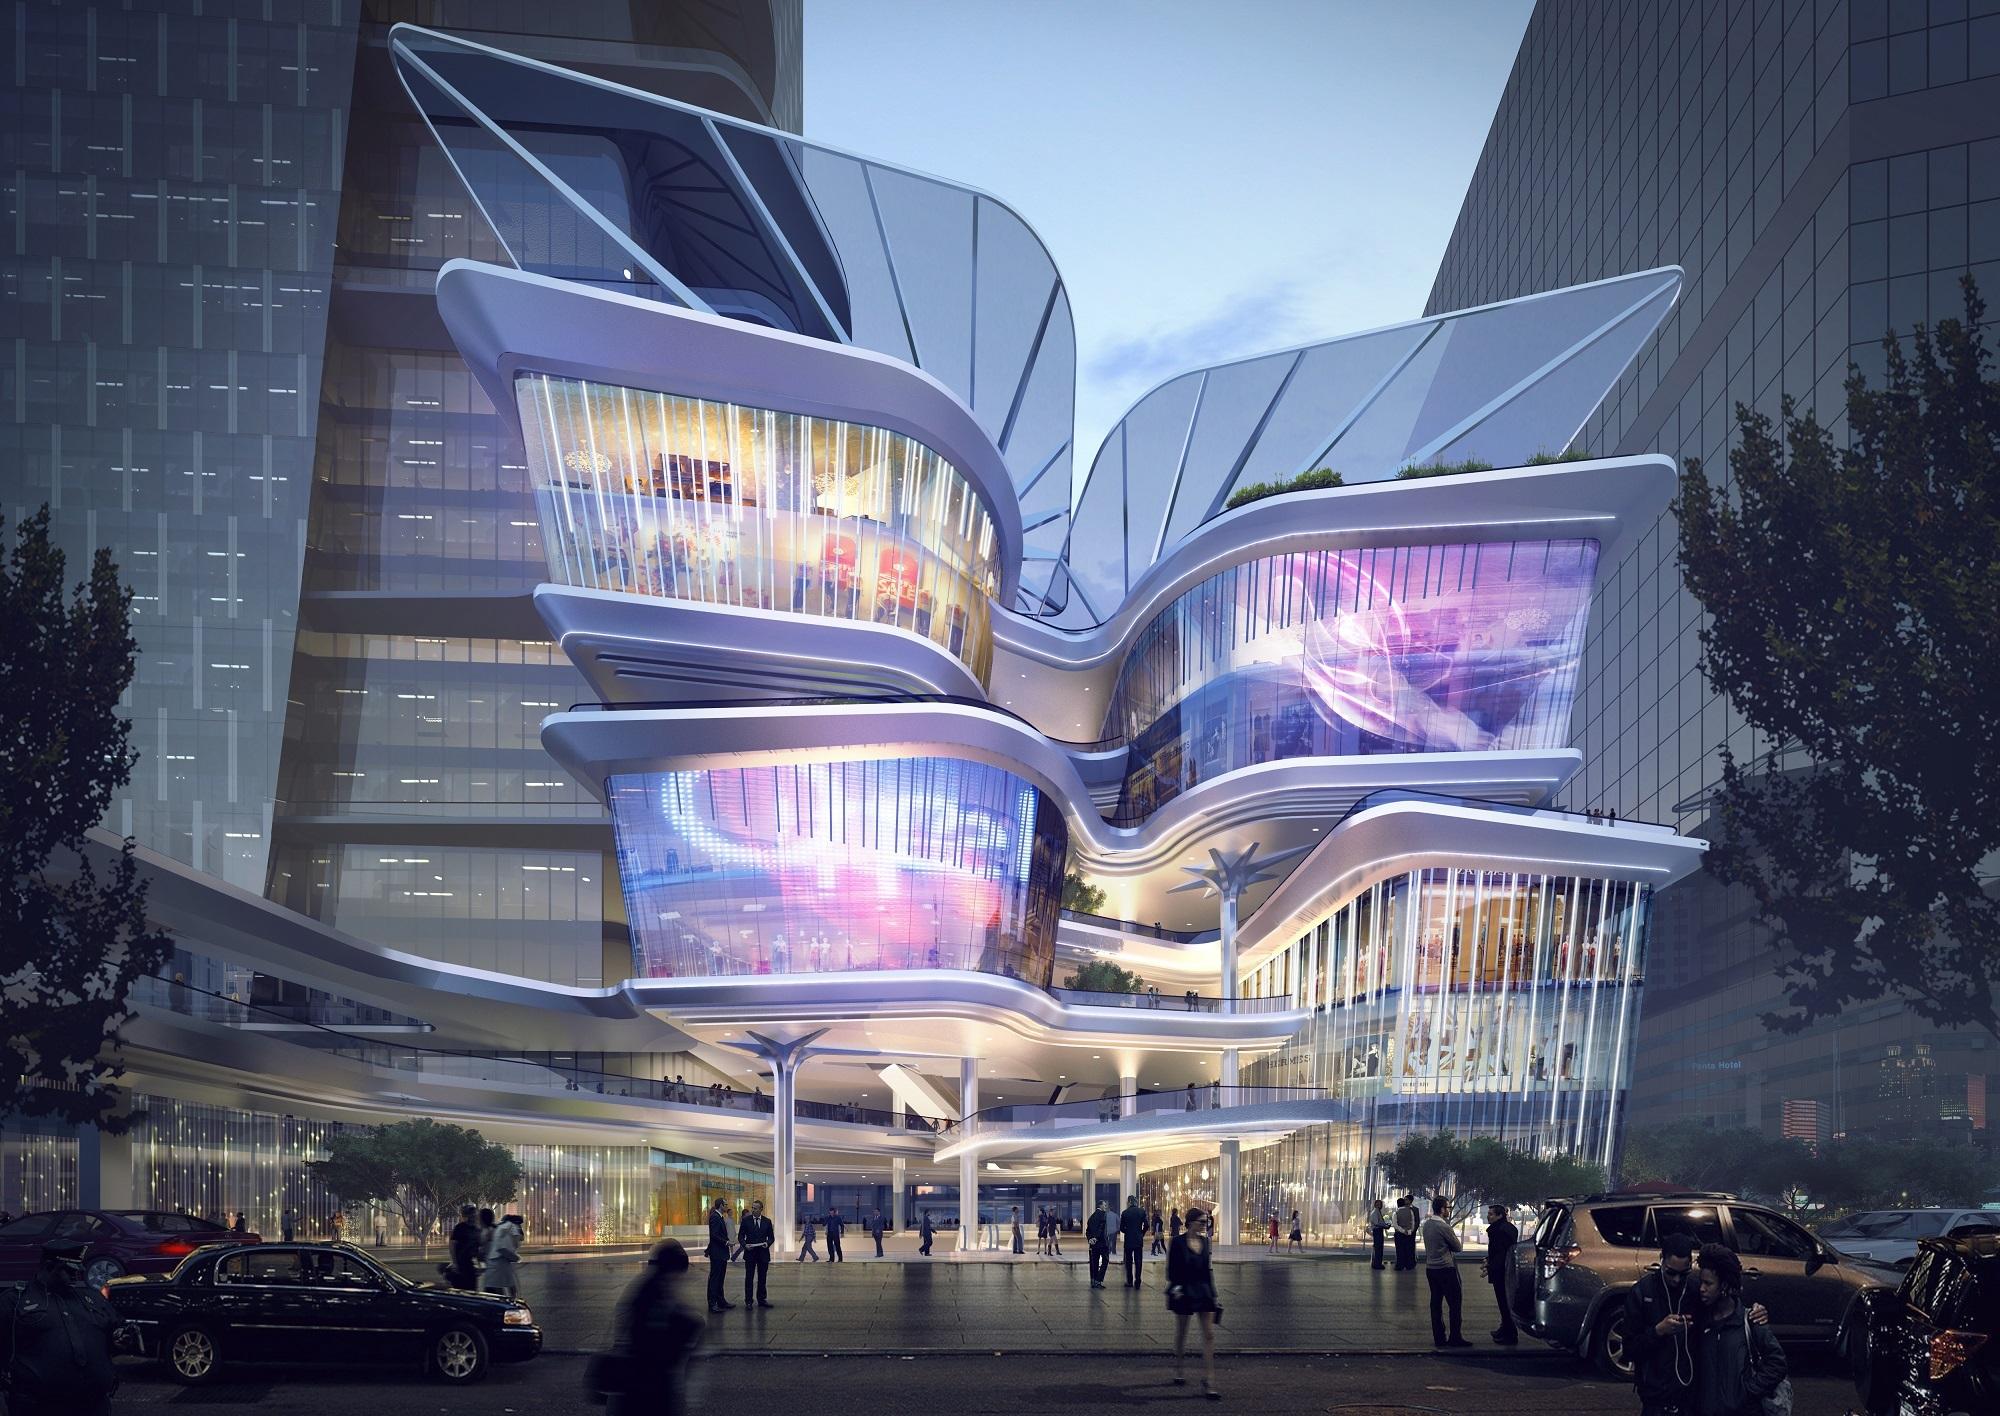 Aedas Reveal Dynamic New Design For The Shenzhen Luoho ...